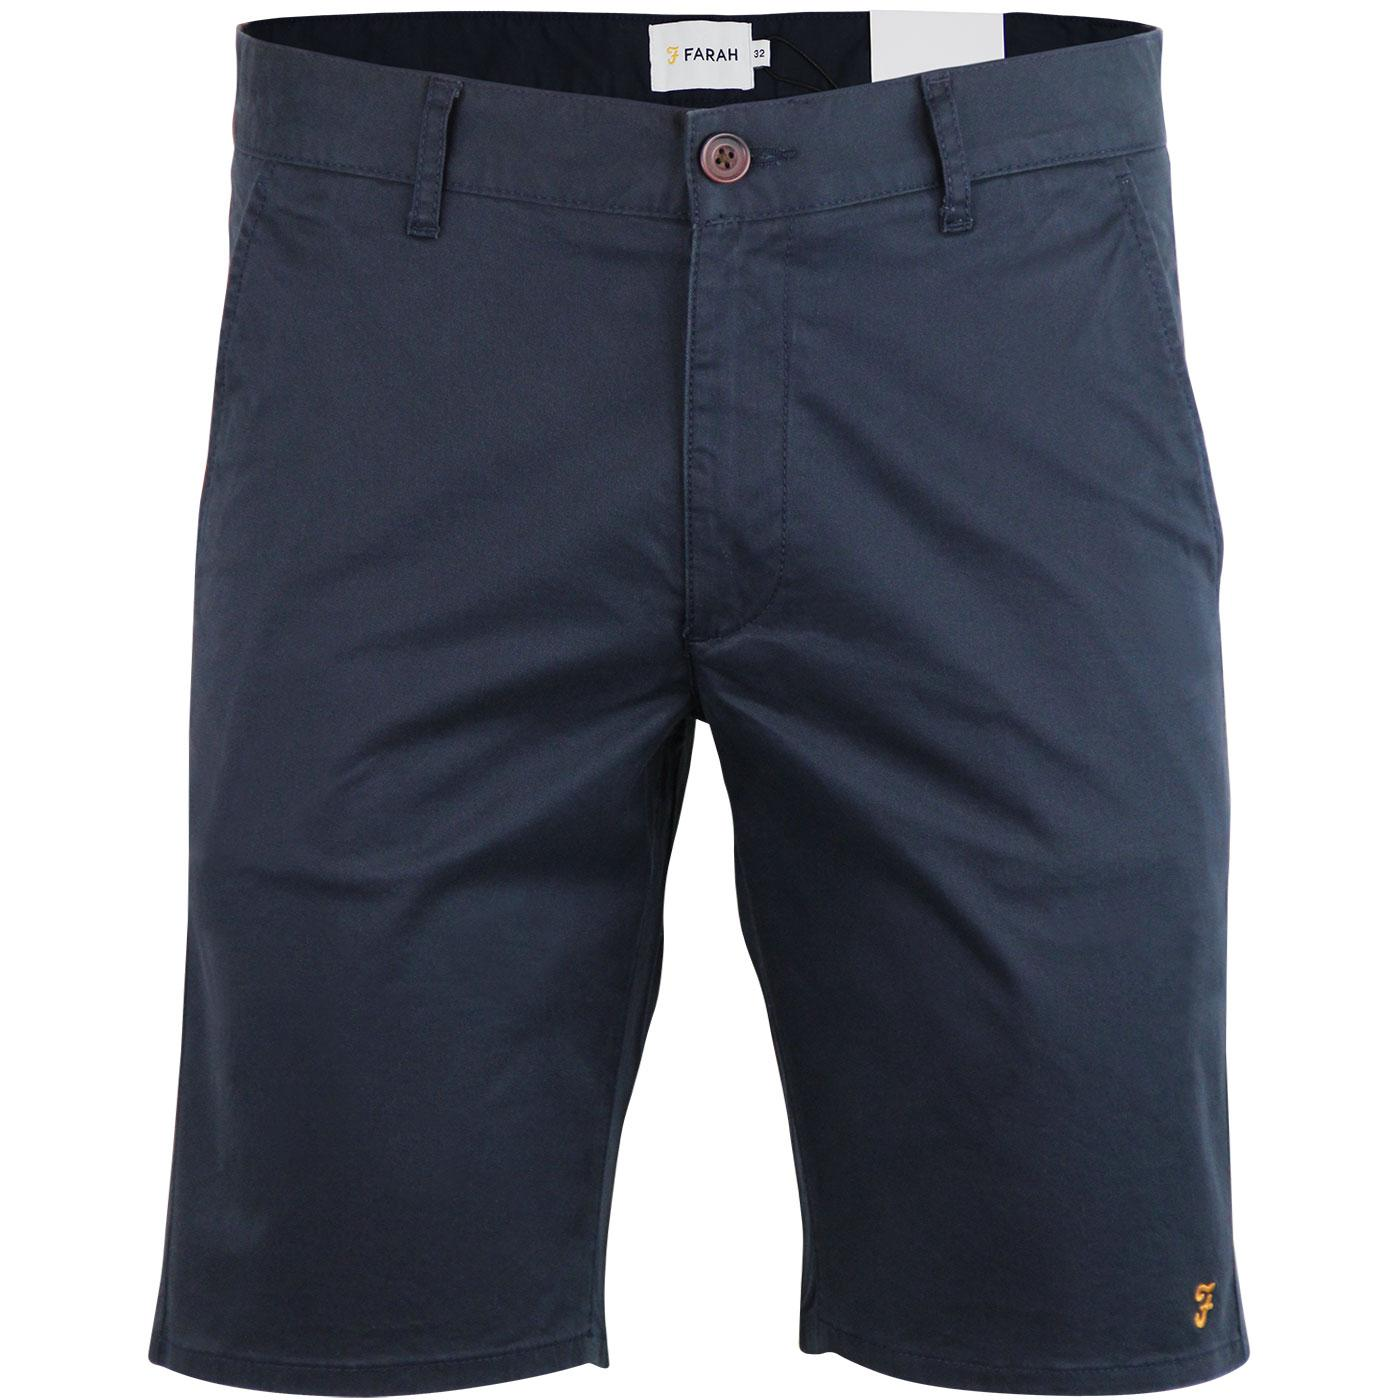 Hawk FARAH Retro Cotton Twill Chino Shorts (Navy)